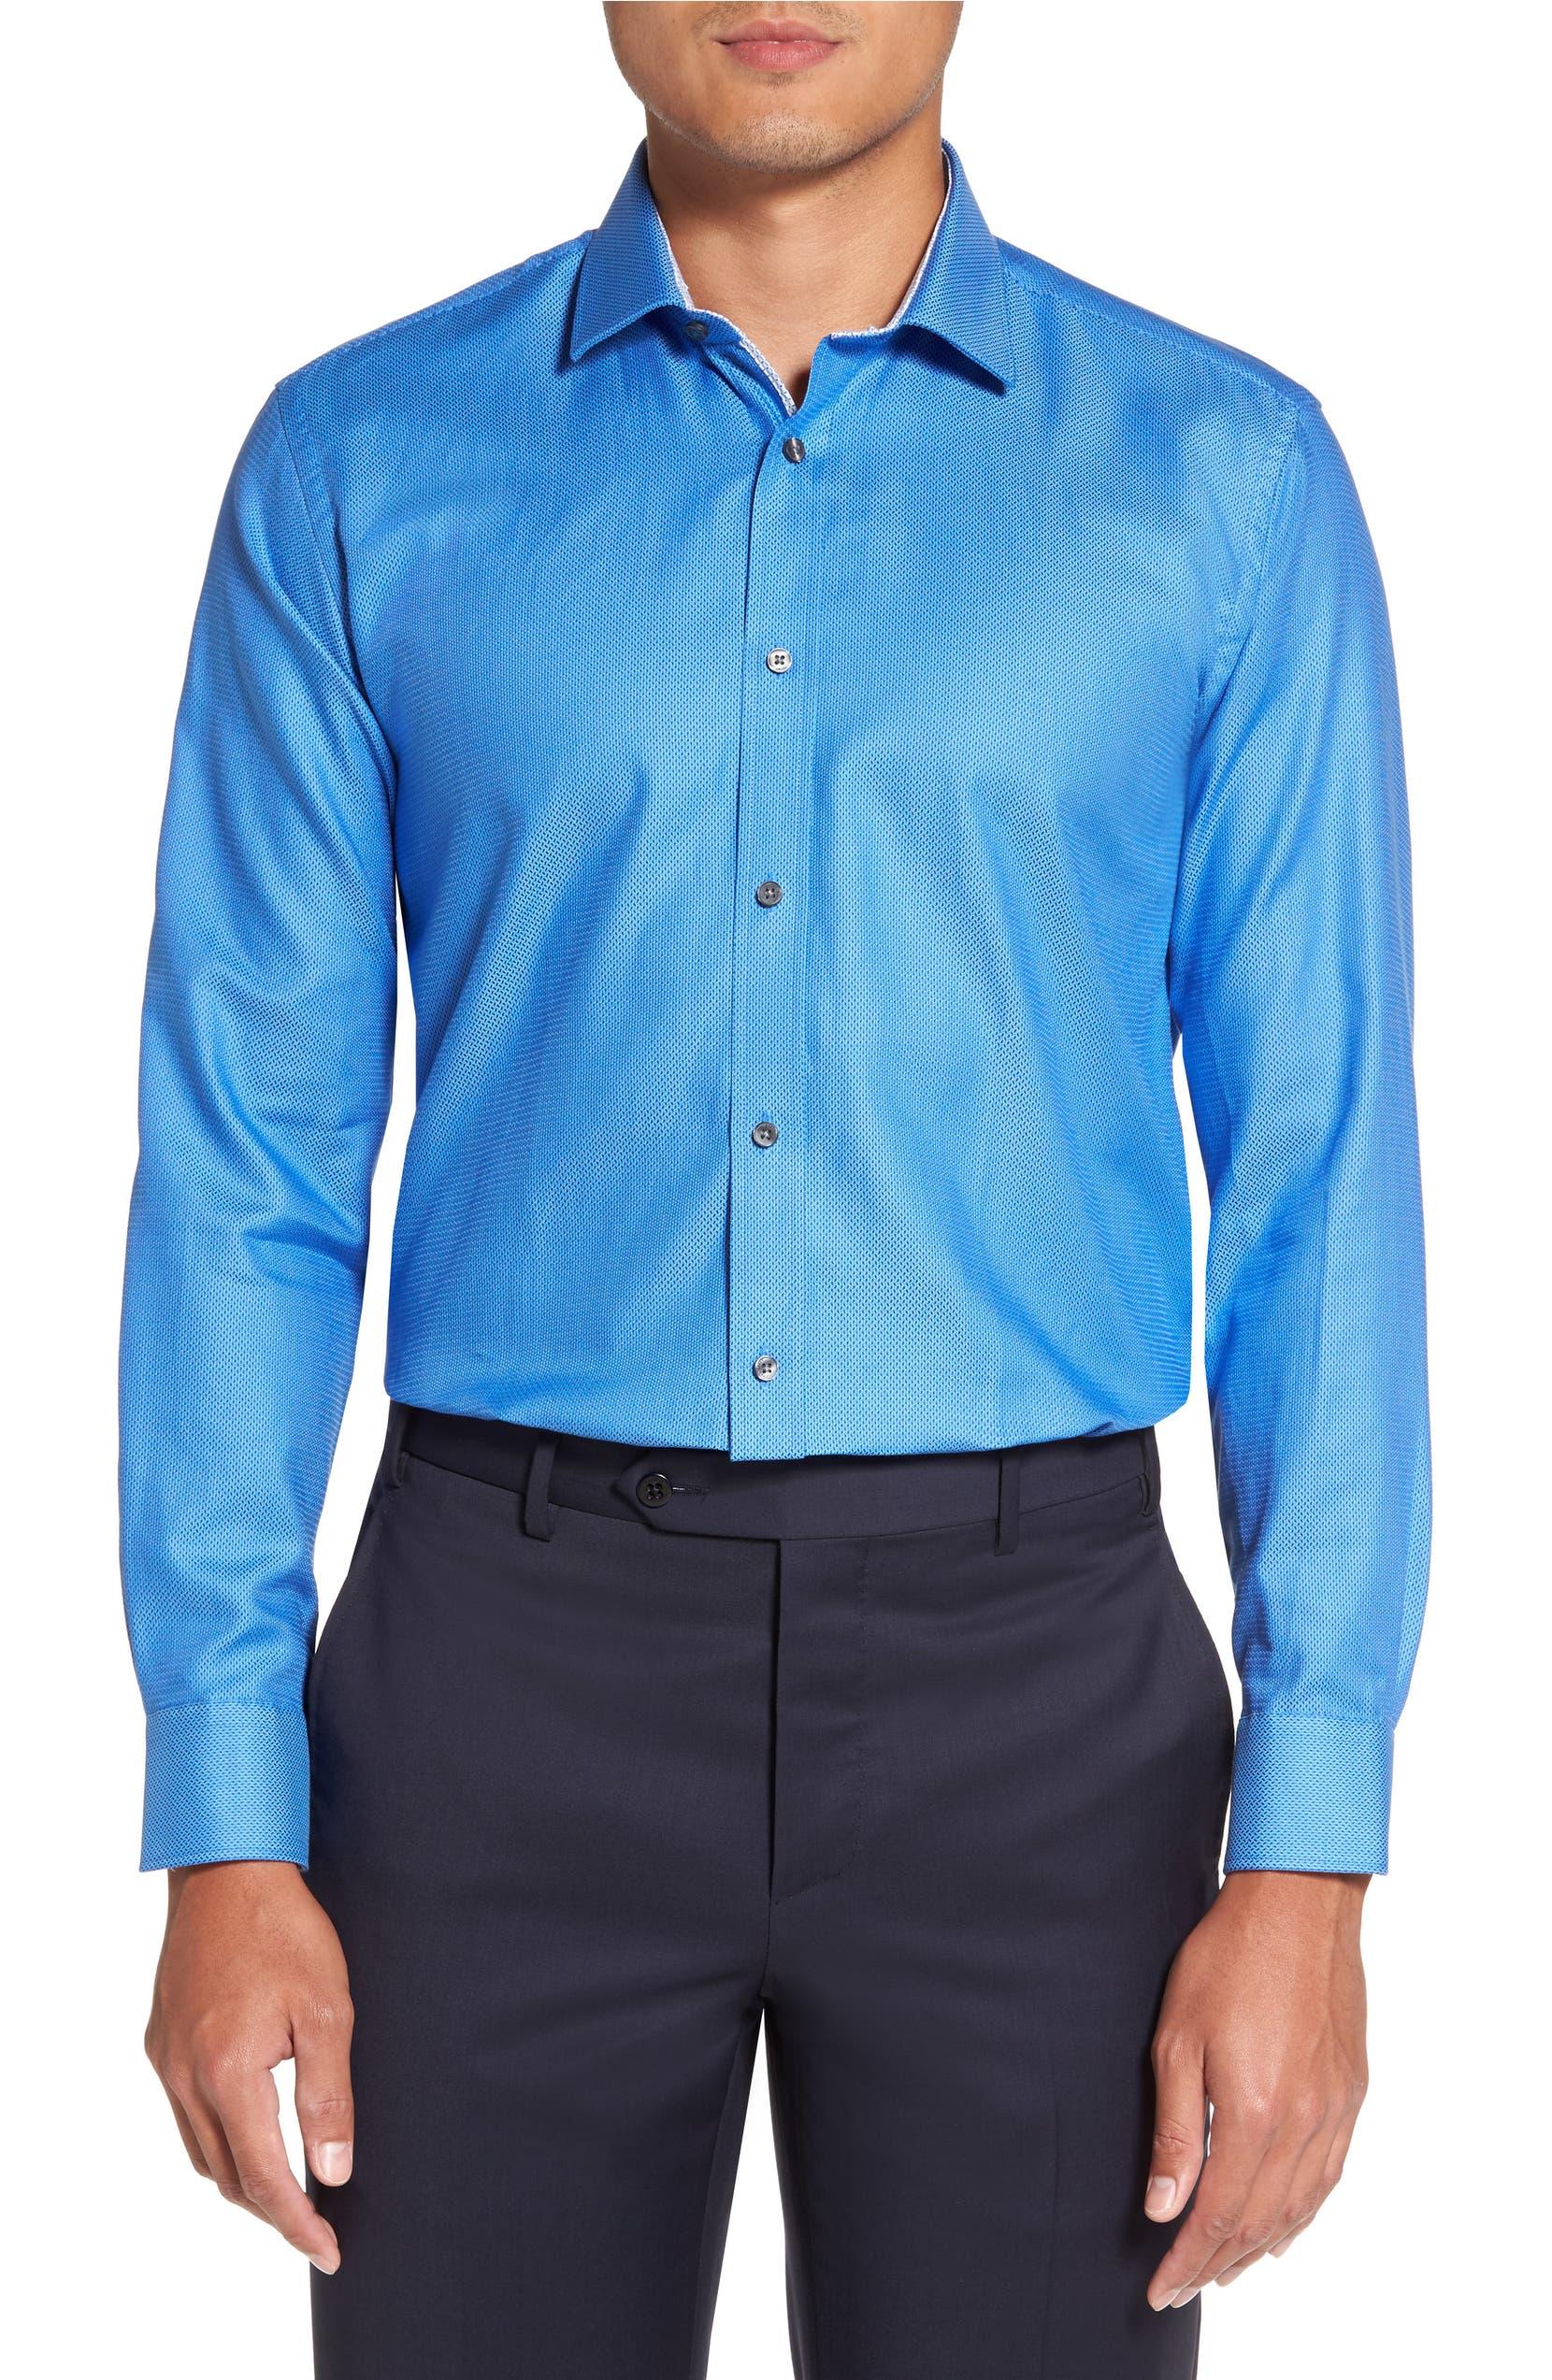 dd0bb8c52ffe8e Ted Baker London Endurance Trim Fit Geometric Dress Shirt